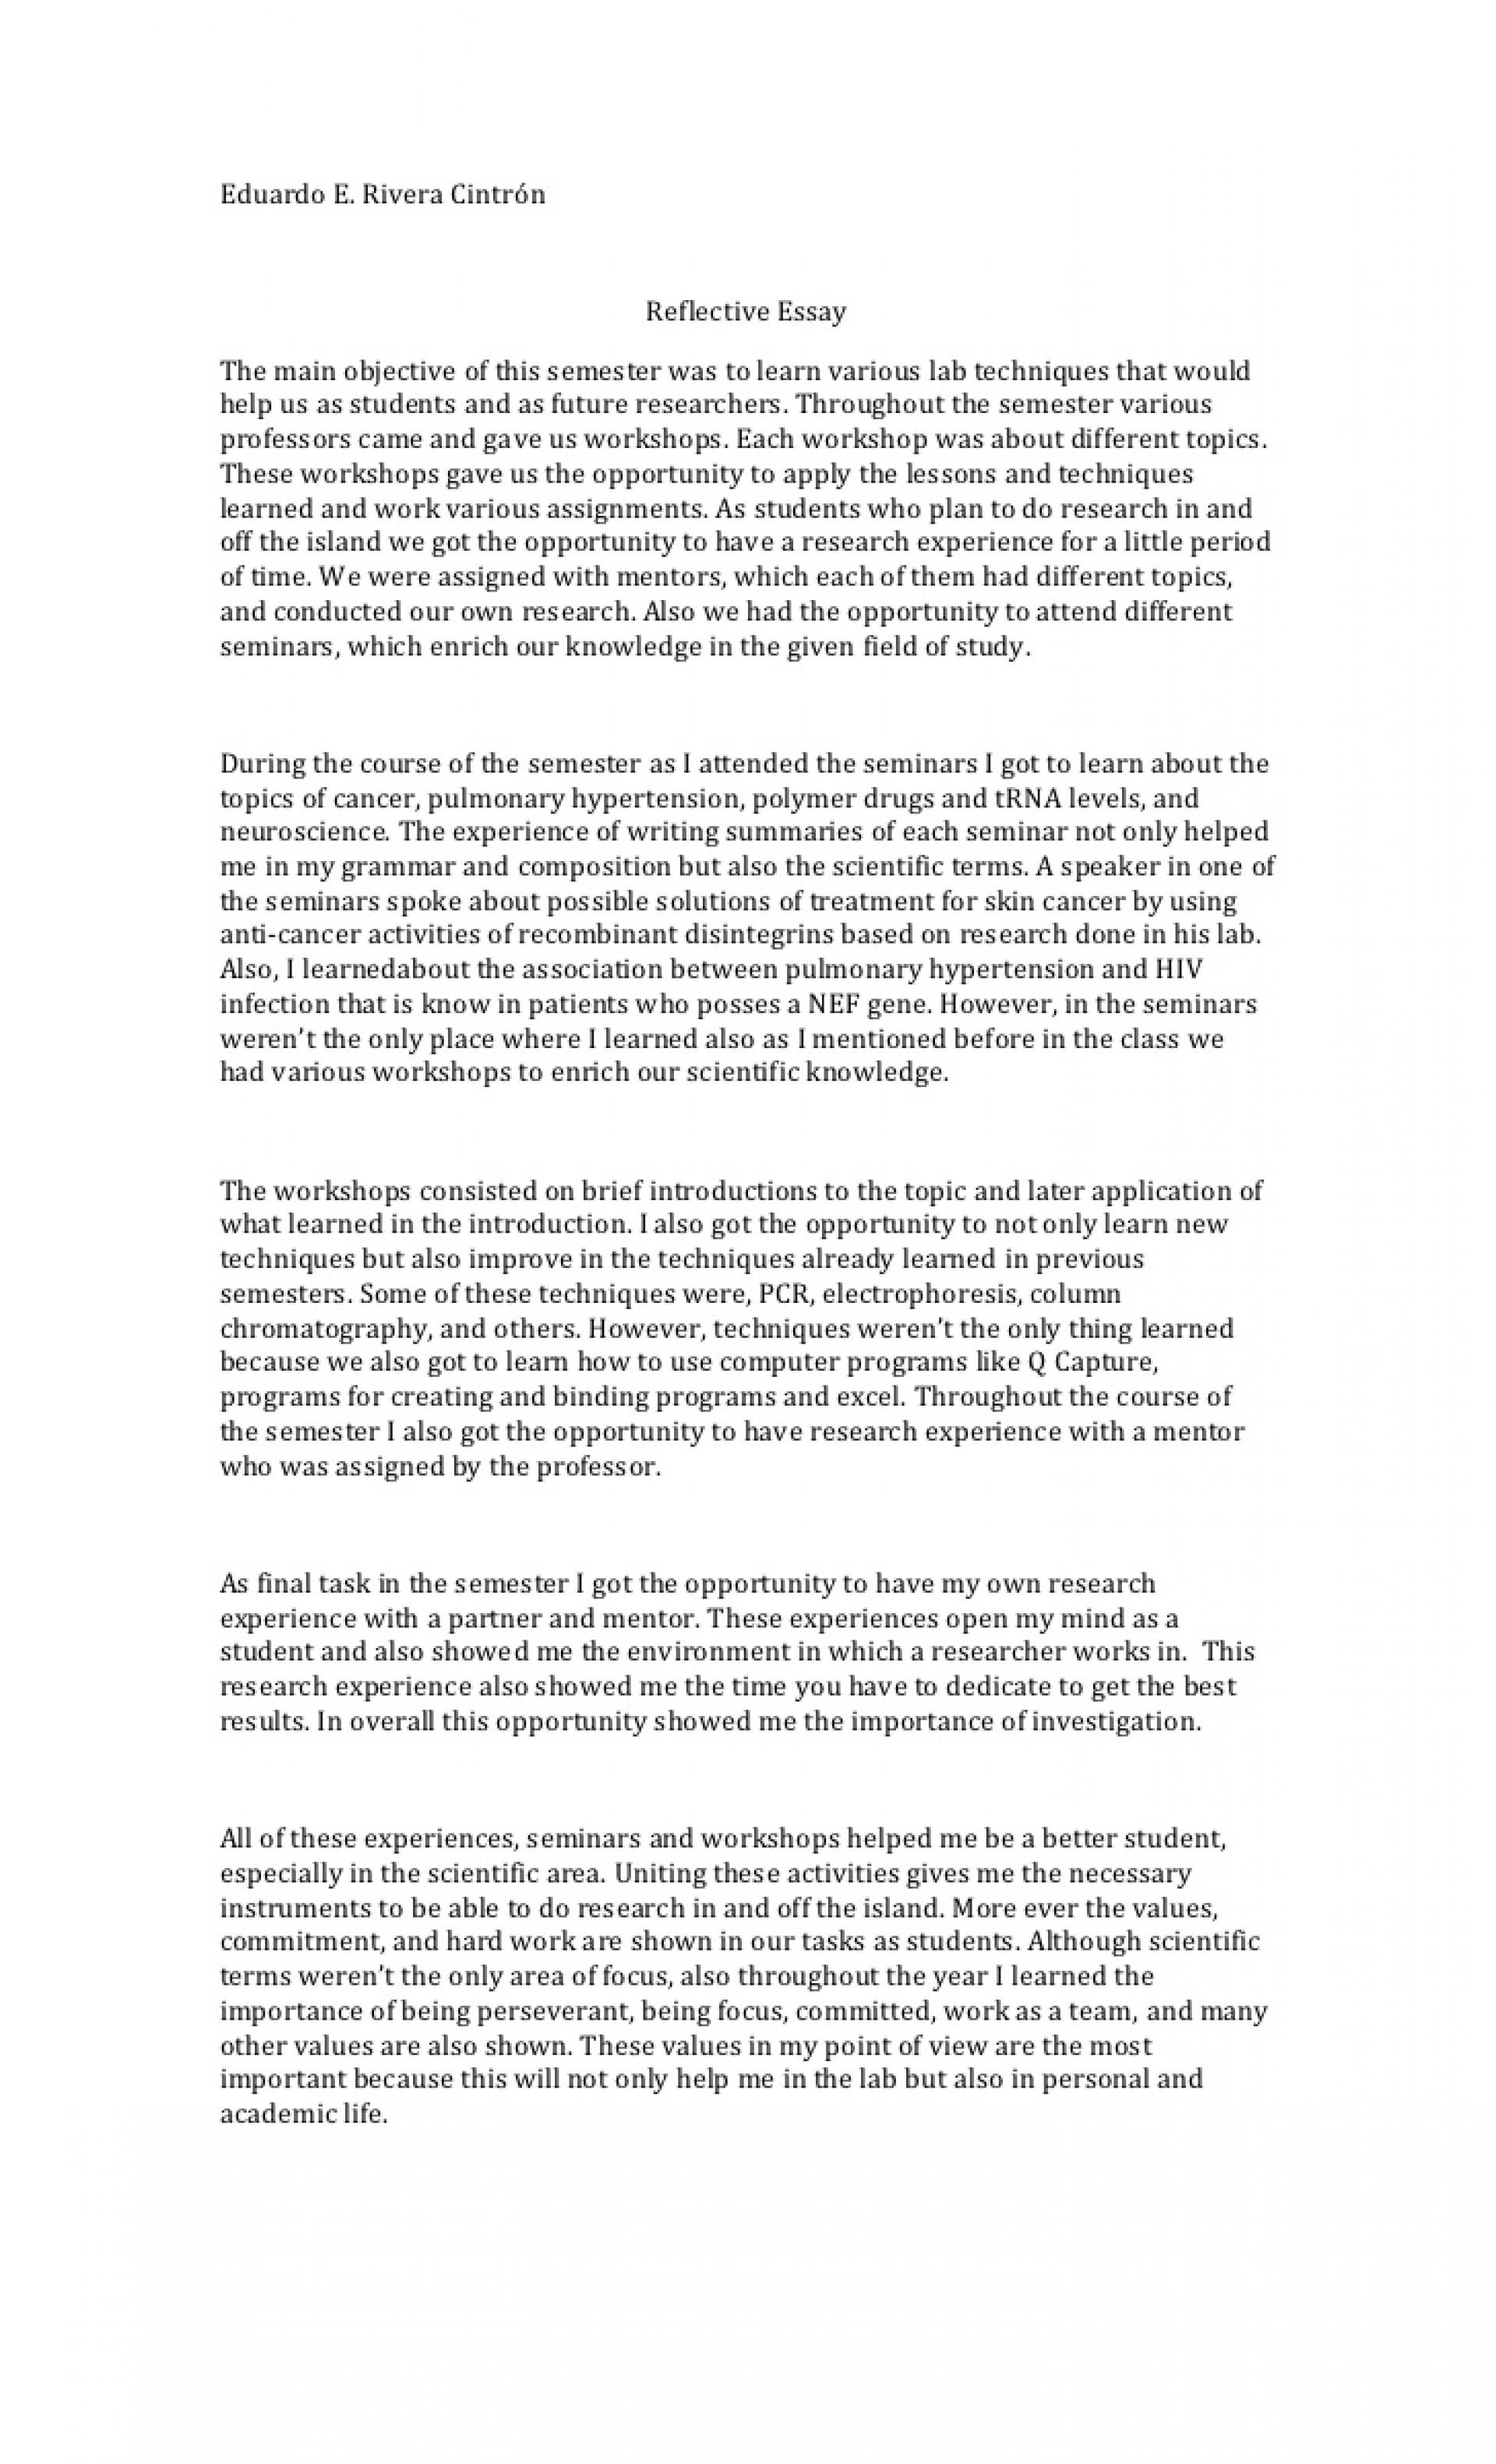 Denis diderot essays